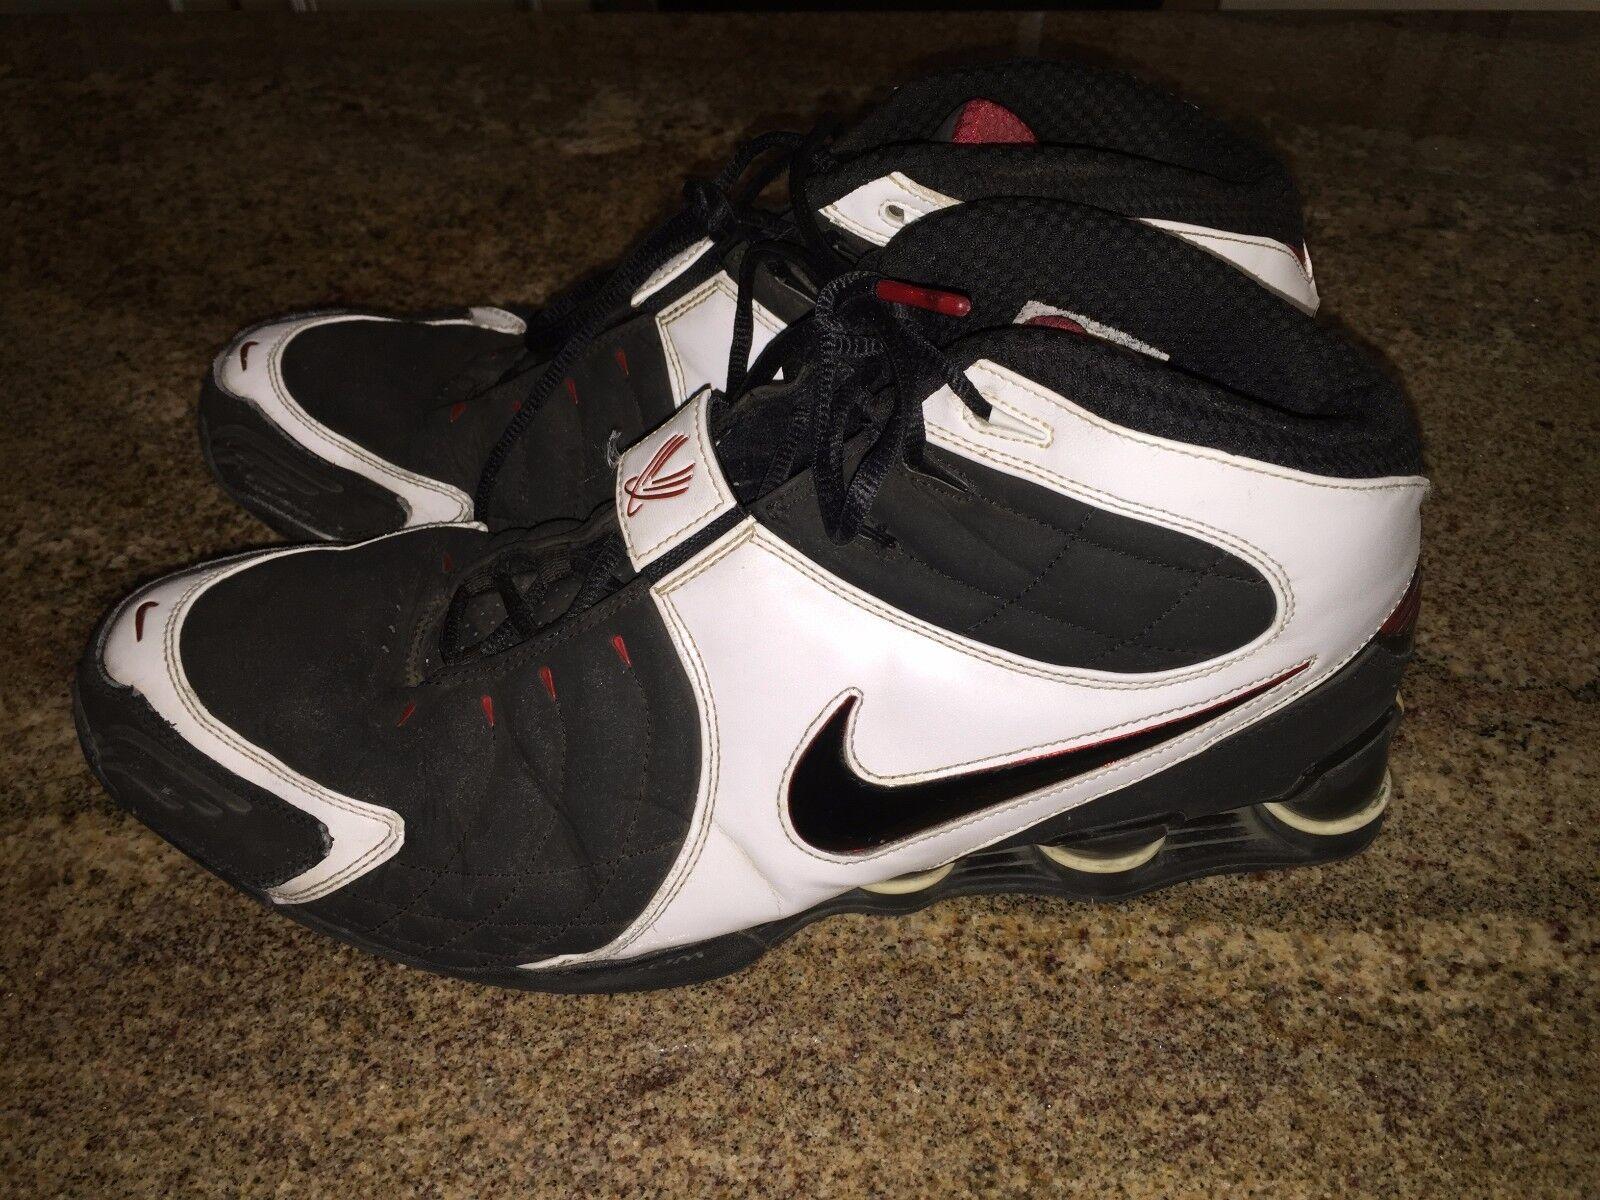 Price reduction Nike Men Shox VC V Vince Carter Basketball Shoes 312764-001 Seasonal clearance sale